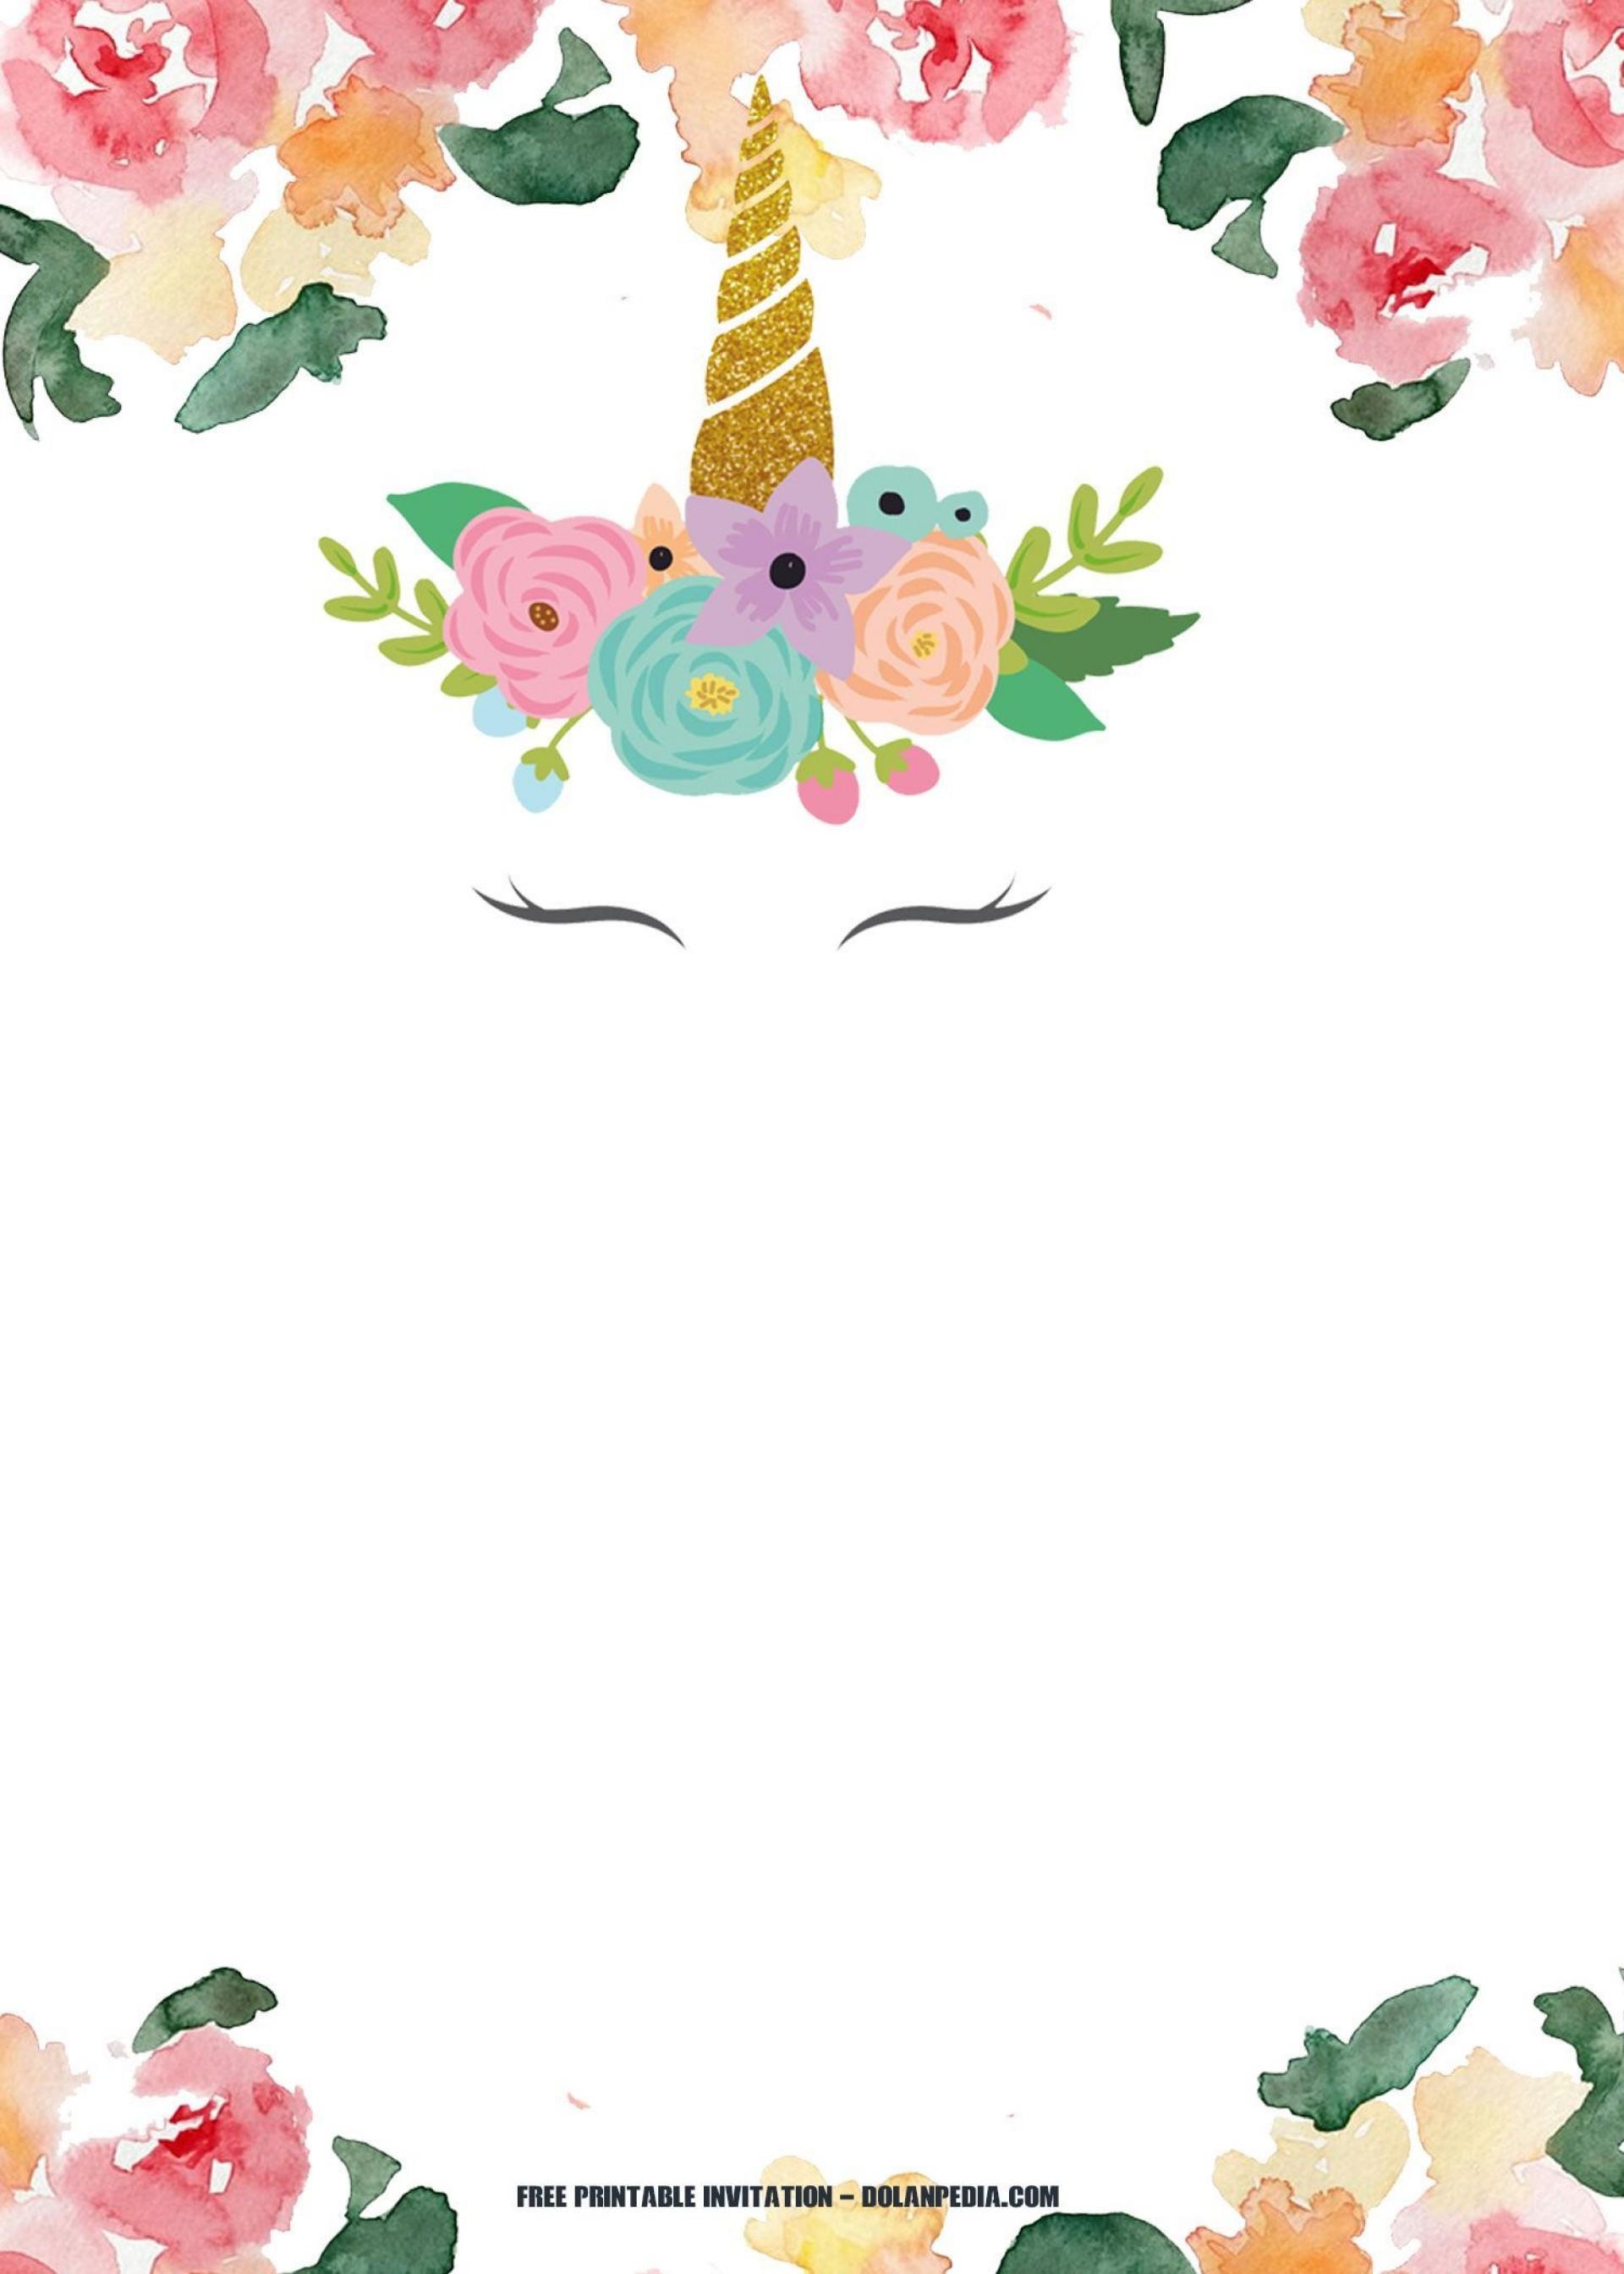 008 Wondrou Unicorn Baby Shower Template Free Download Sample  Printable Invitation1920